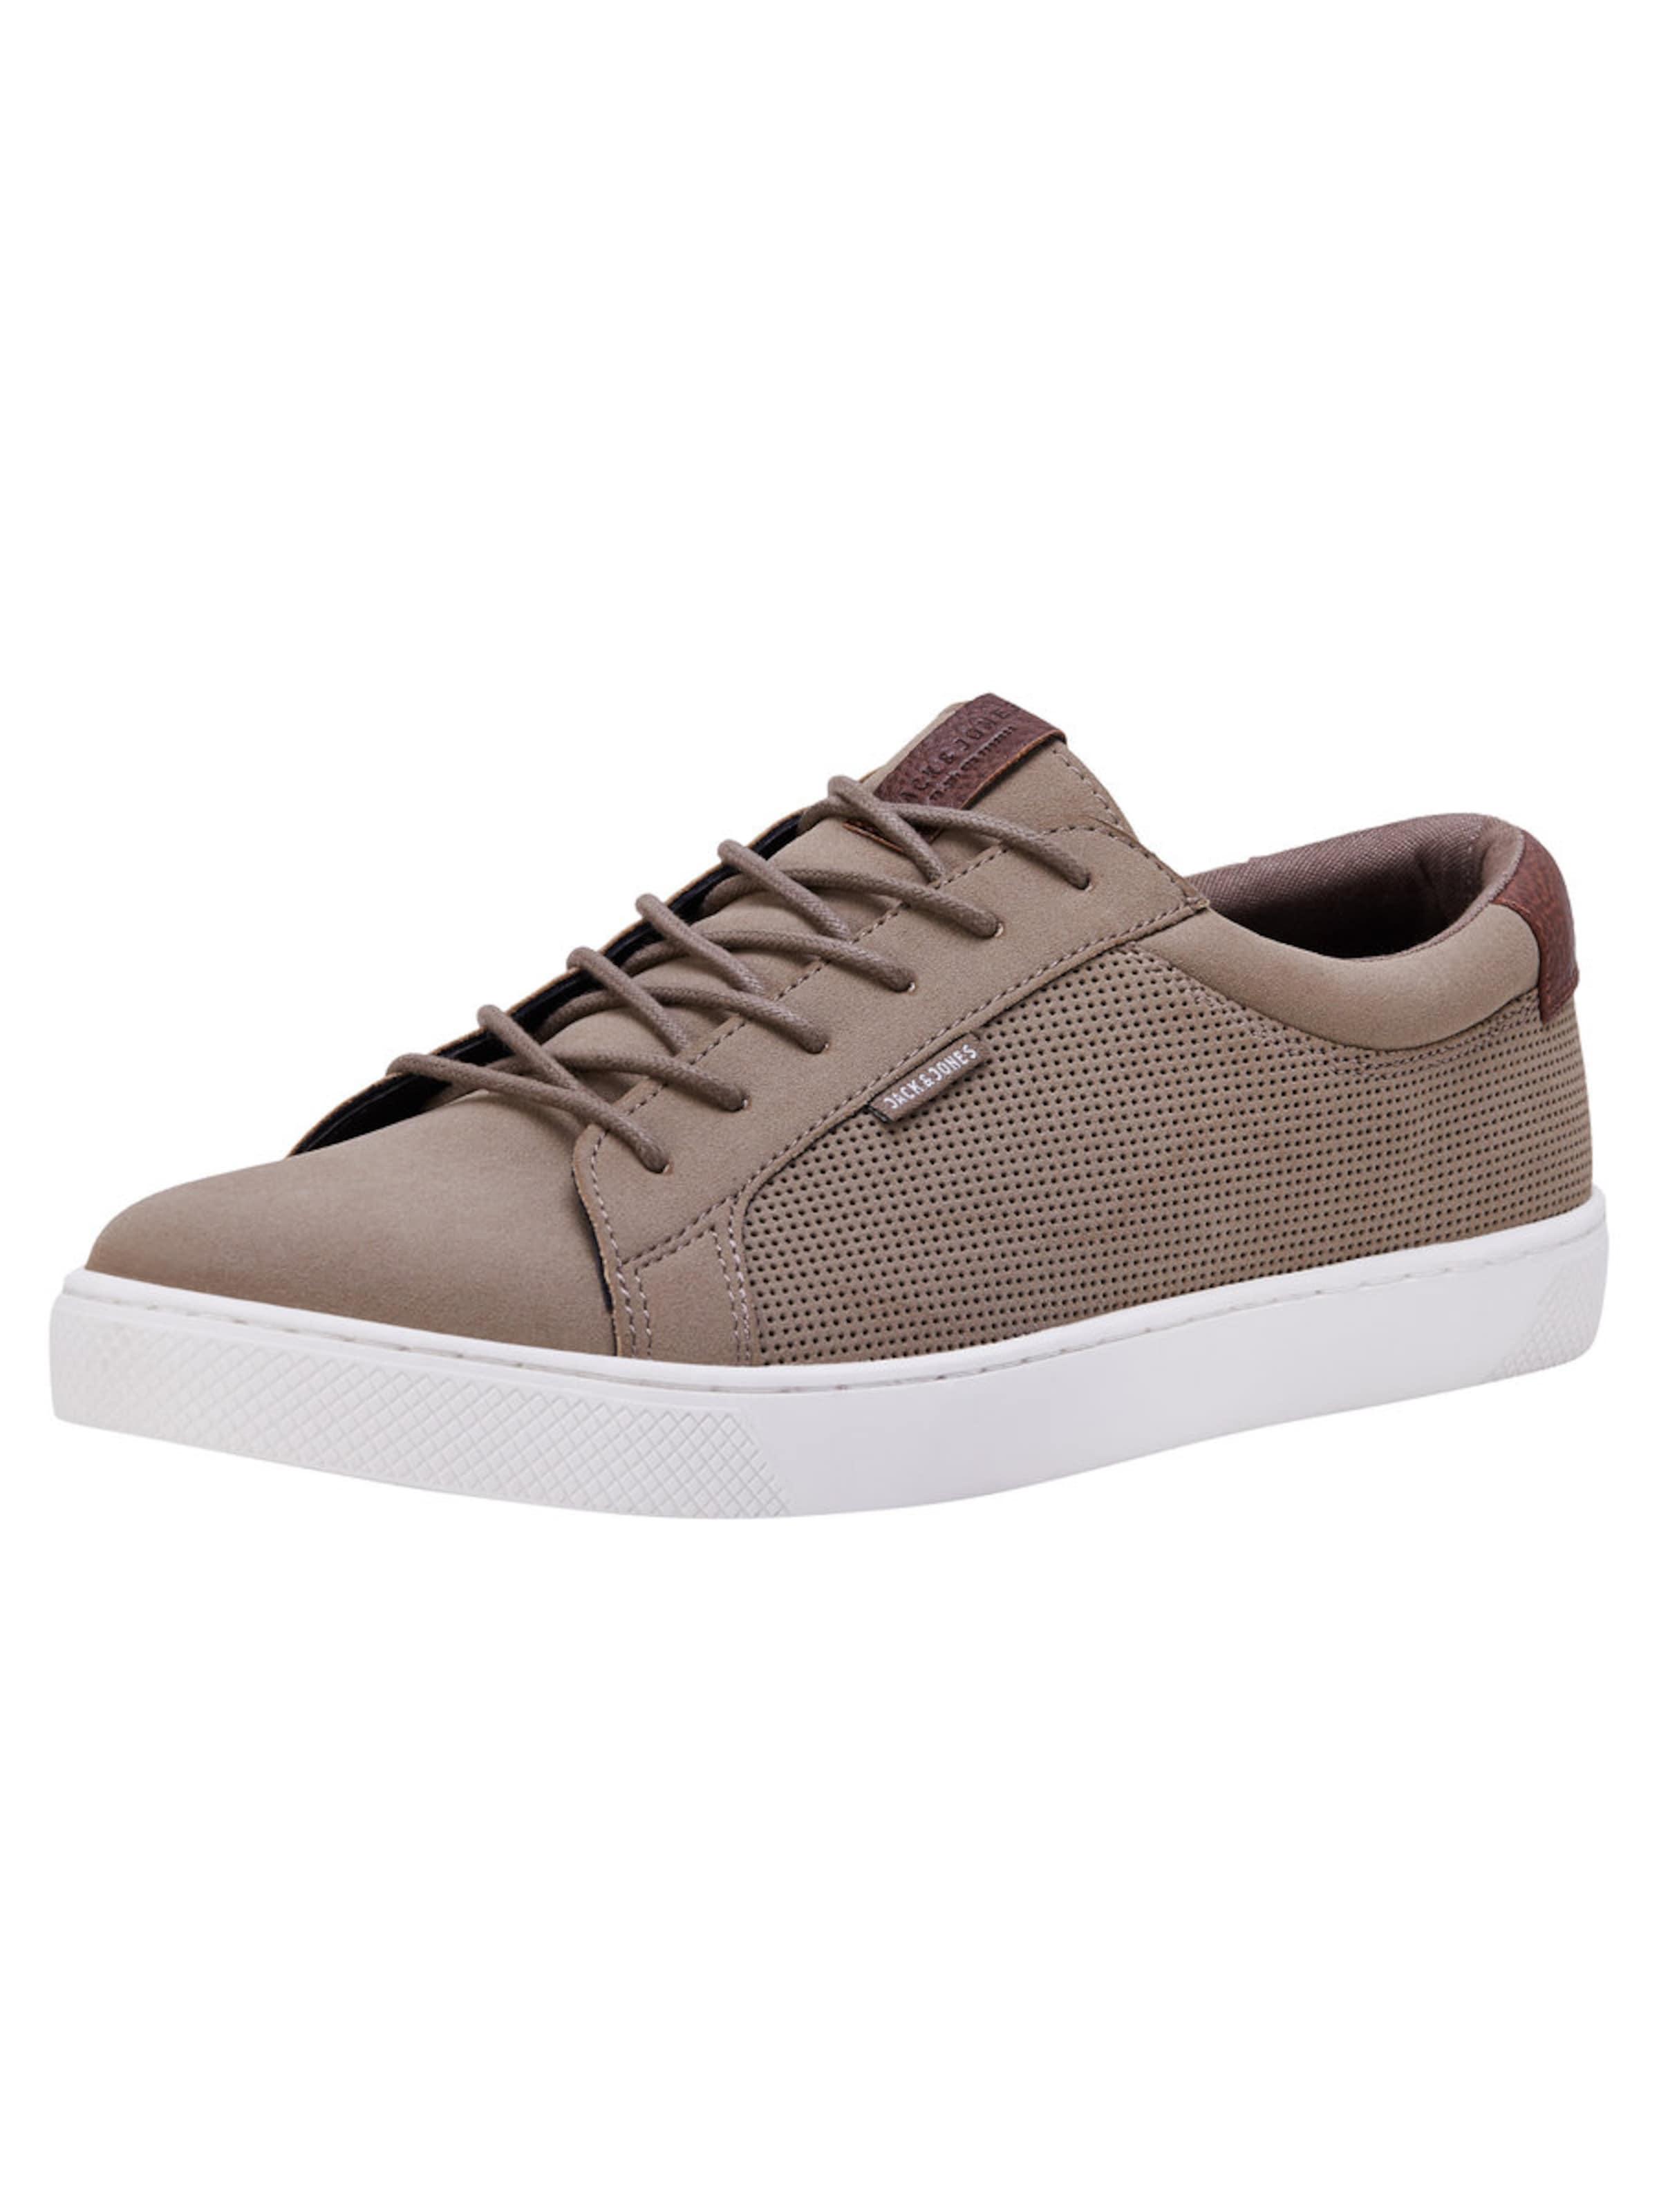 JACK & JONES Sneaker Günstige und langlebige Schuhe